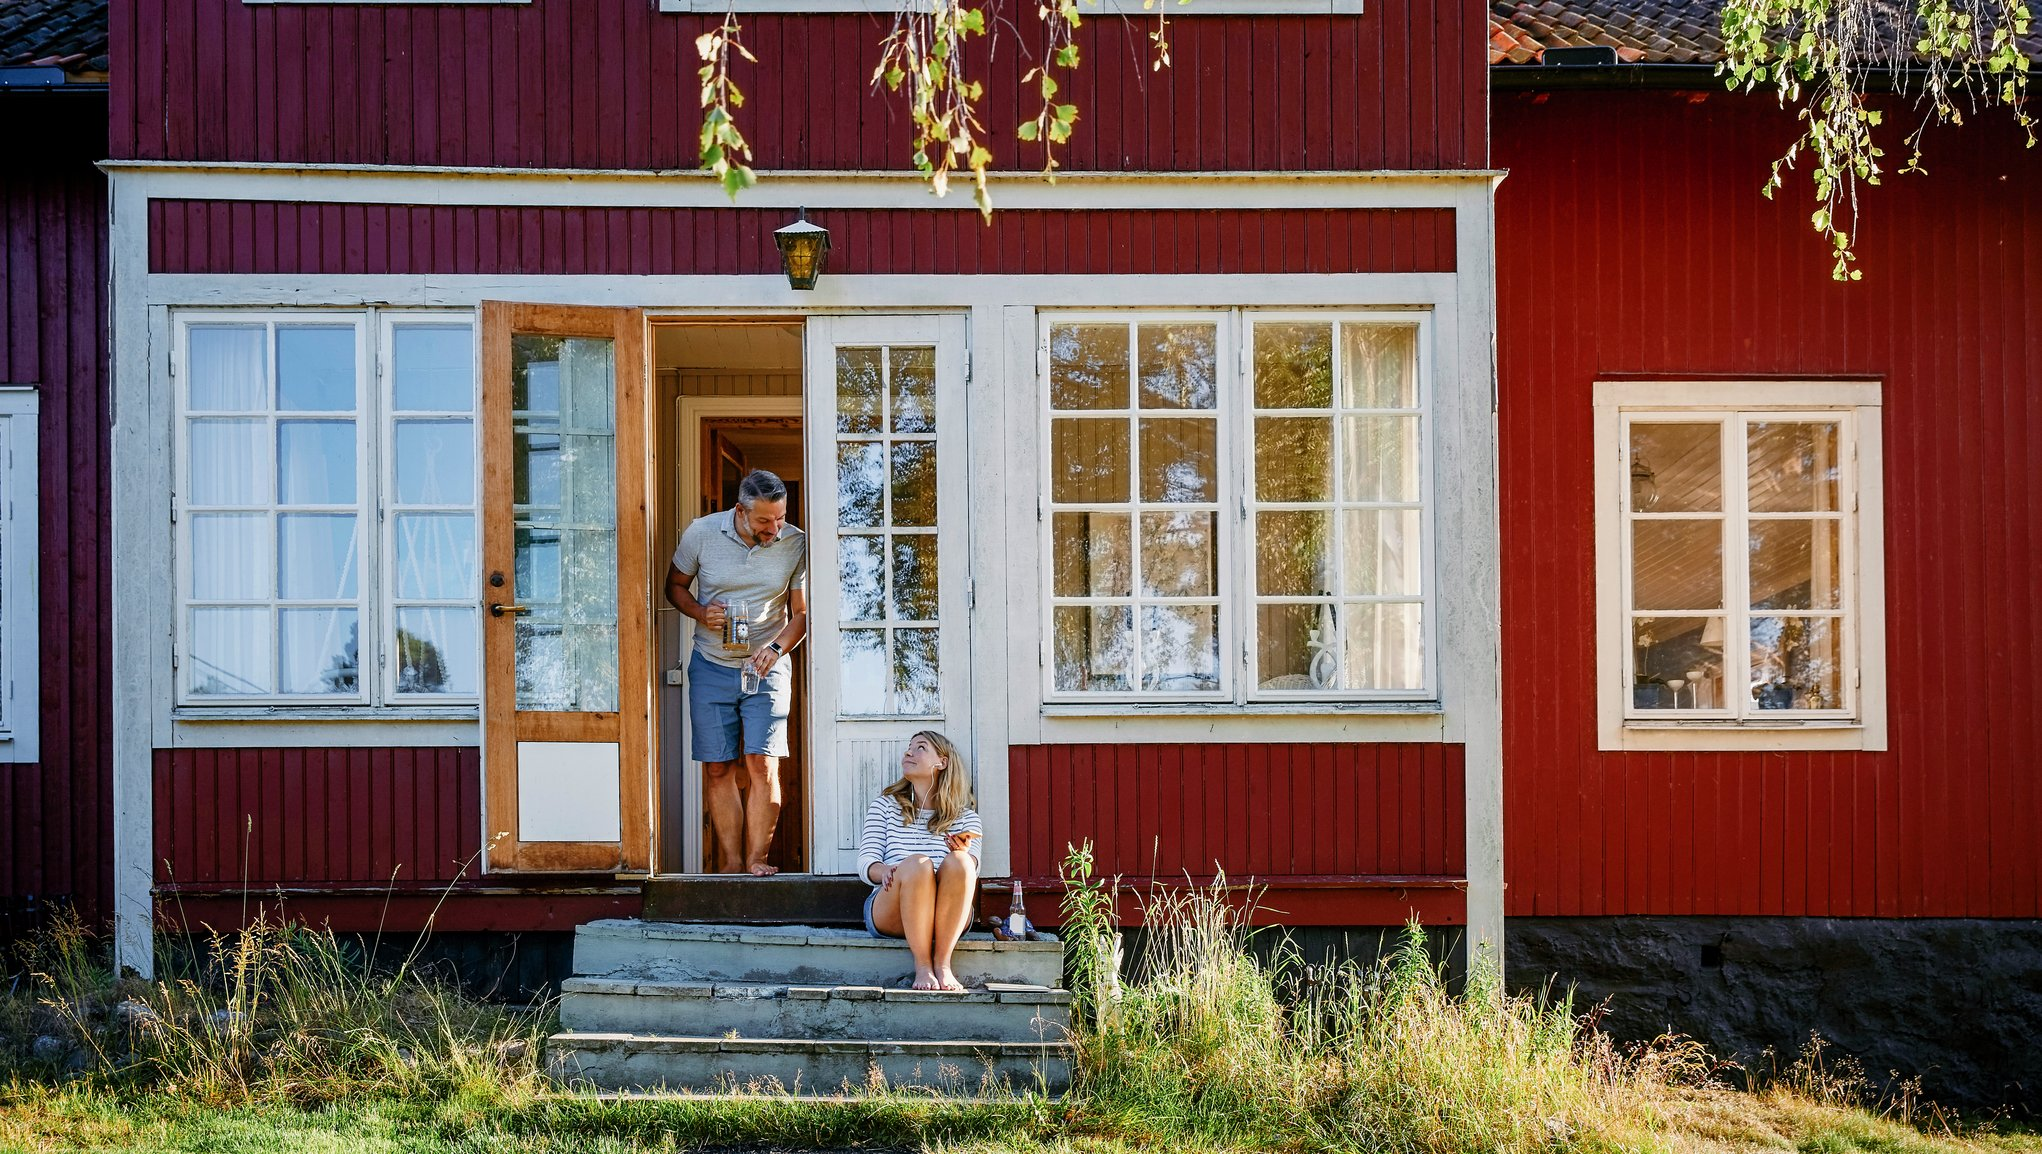 Et par utenfor et rødt hus